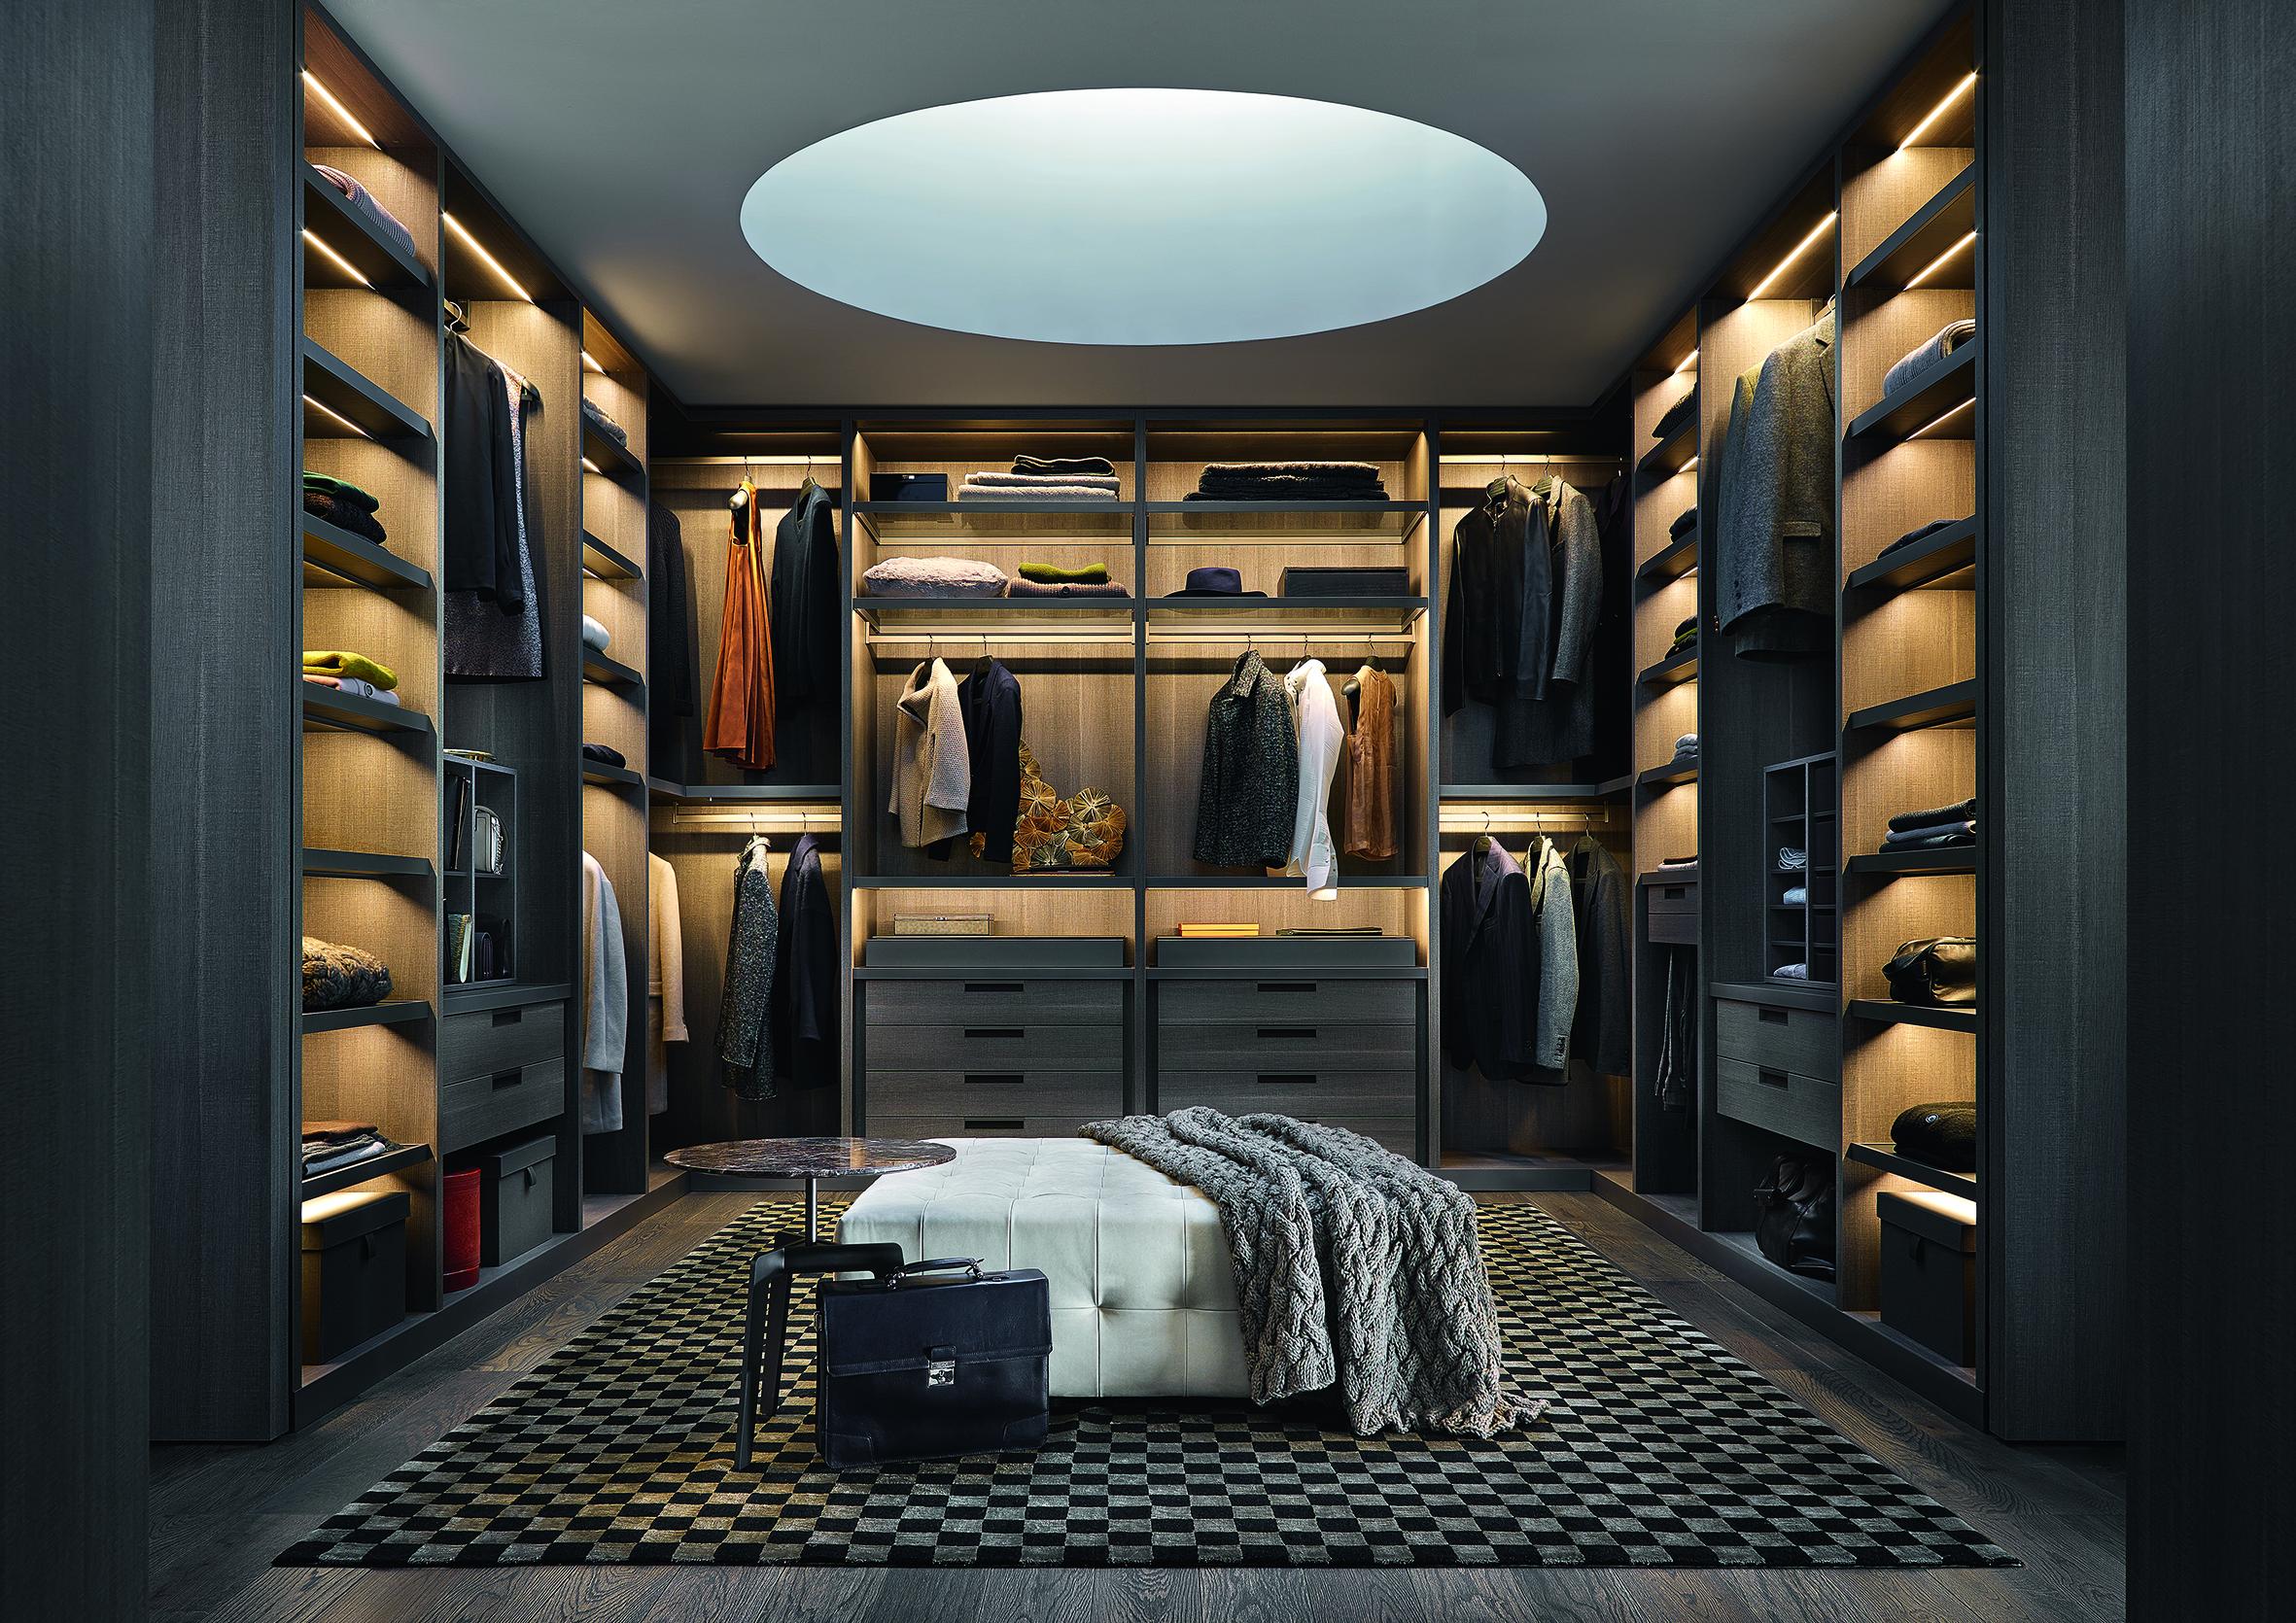 Dressing Poliform design dressing slaapkamer loncin leuven brussel mechelen antwerpen brabant limnurg hasselt genk wavre waterloo slaapkamer design meubelwinkel interieurwinkel interieurarchitect.jpg